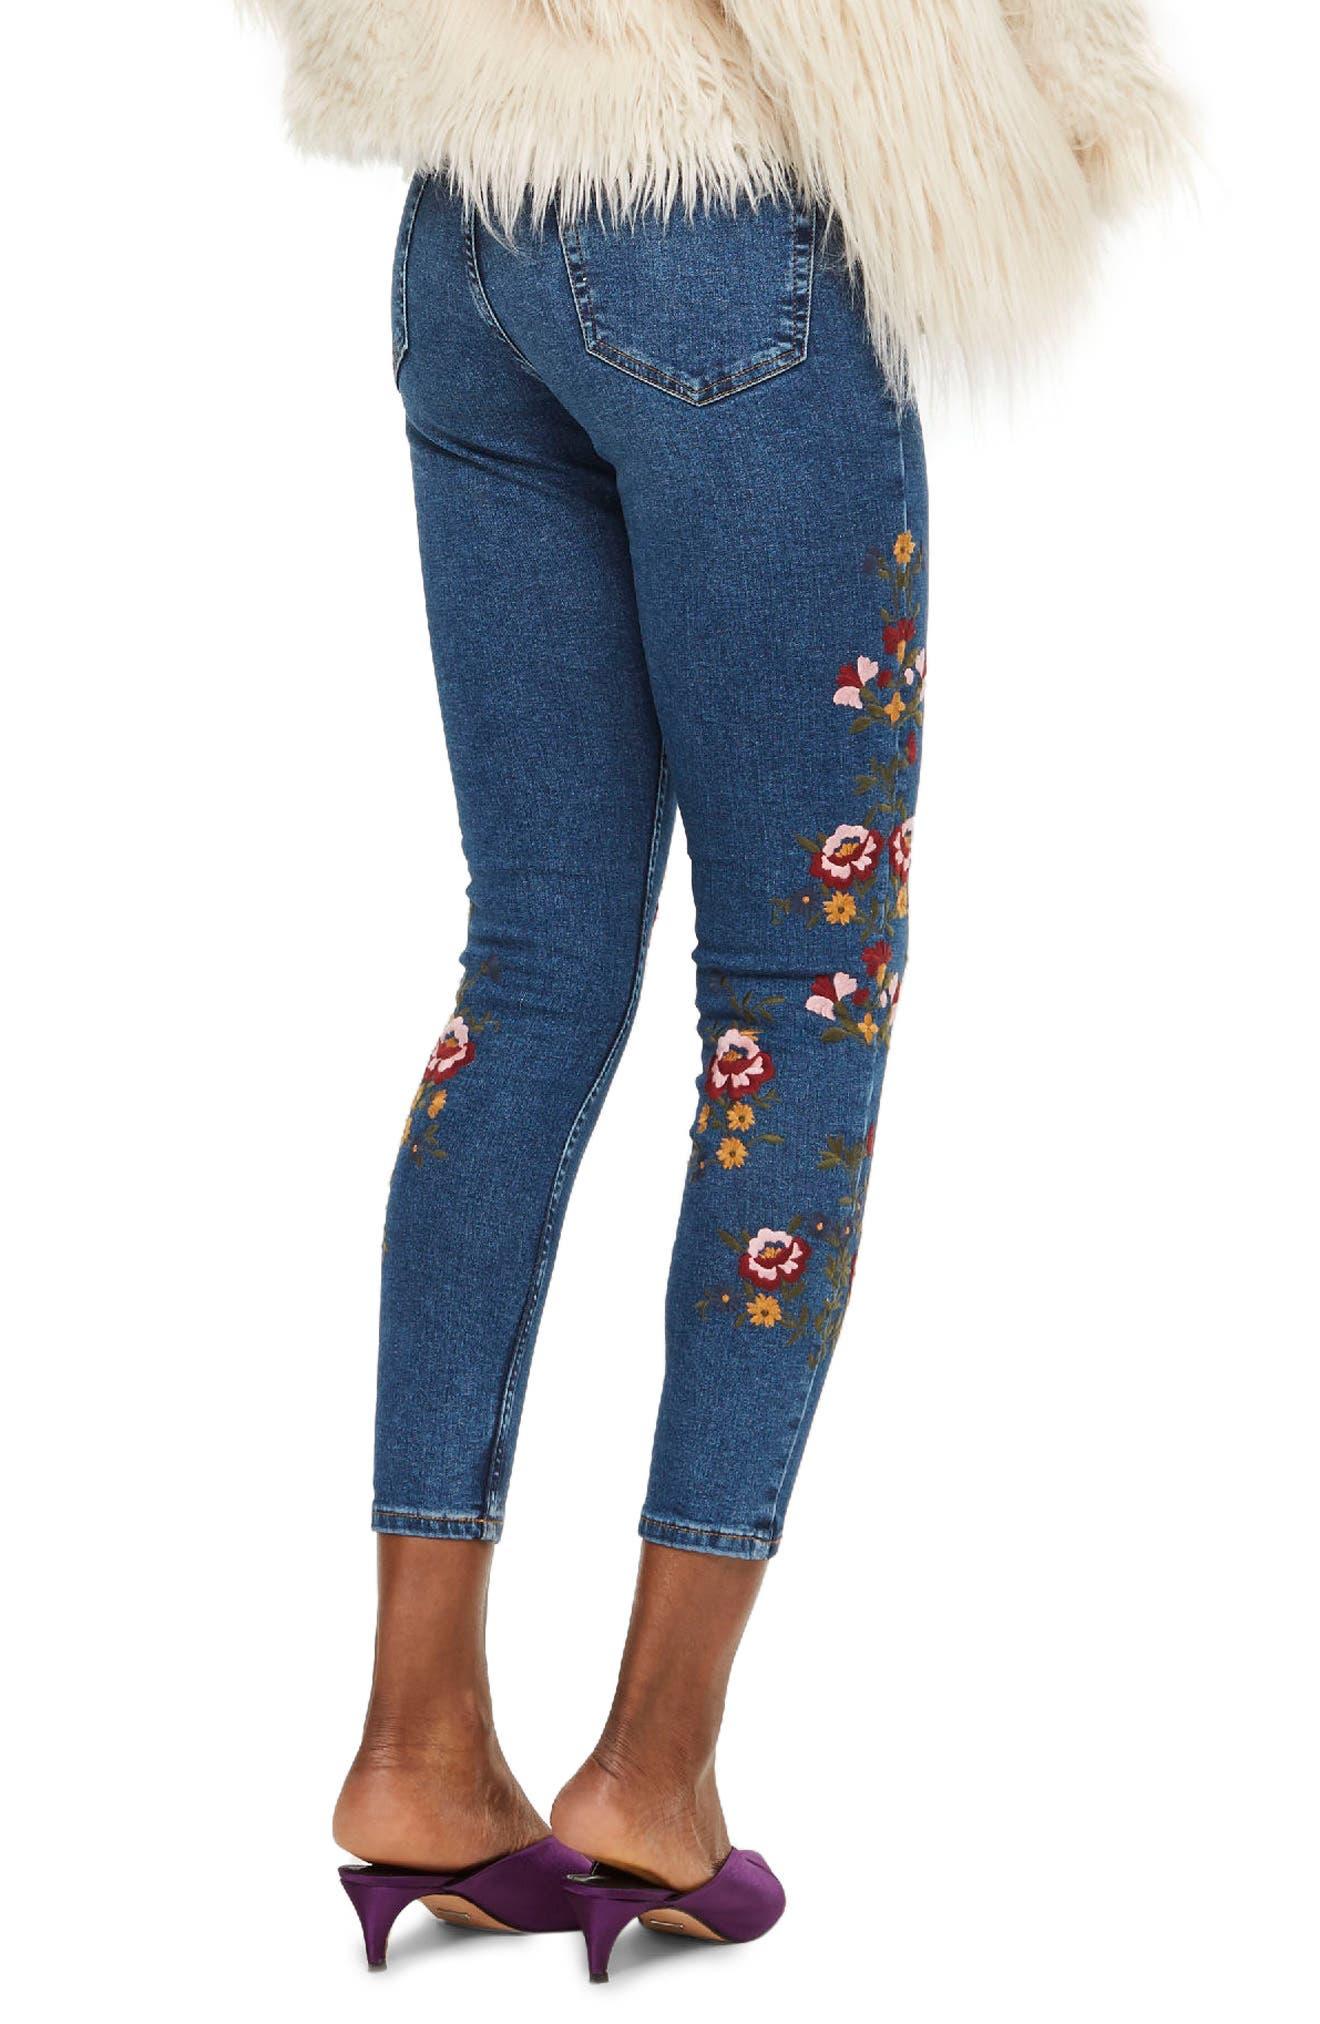 Jamie Ditsy Floral Jeans,                             Alternate thumbnail 2, color,                             Mid Denim Multi